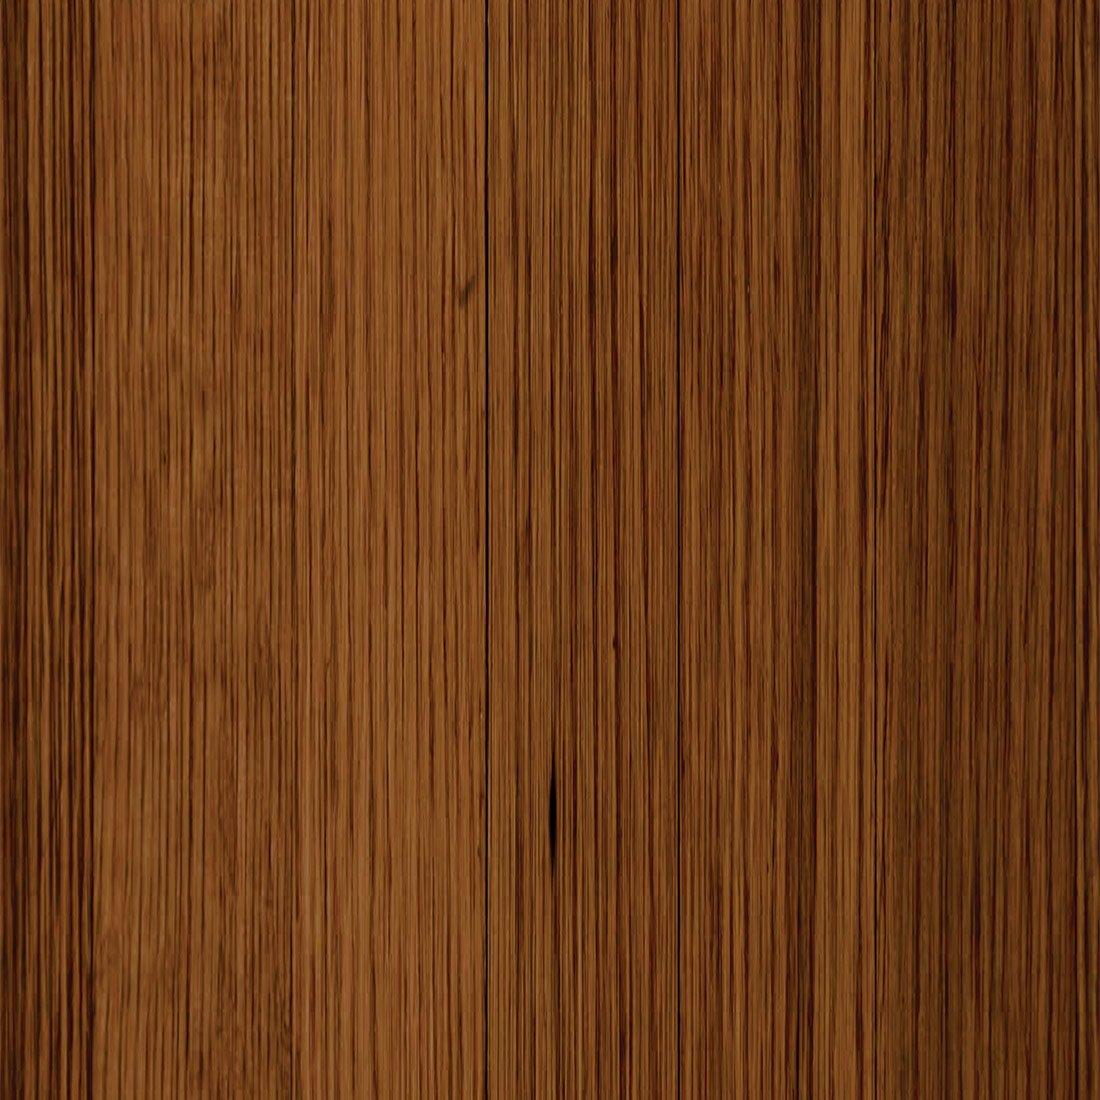 papel de parede estilo madeira jacaranda papel de parede infantil #49210C 1100x1100